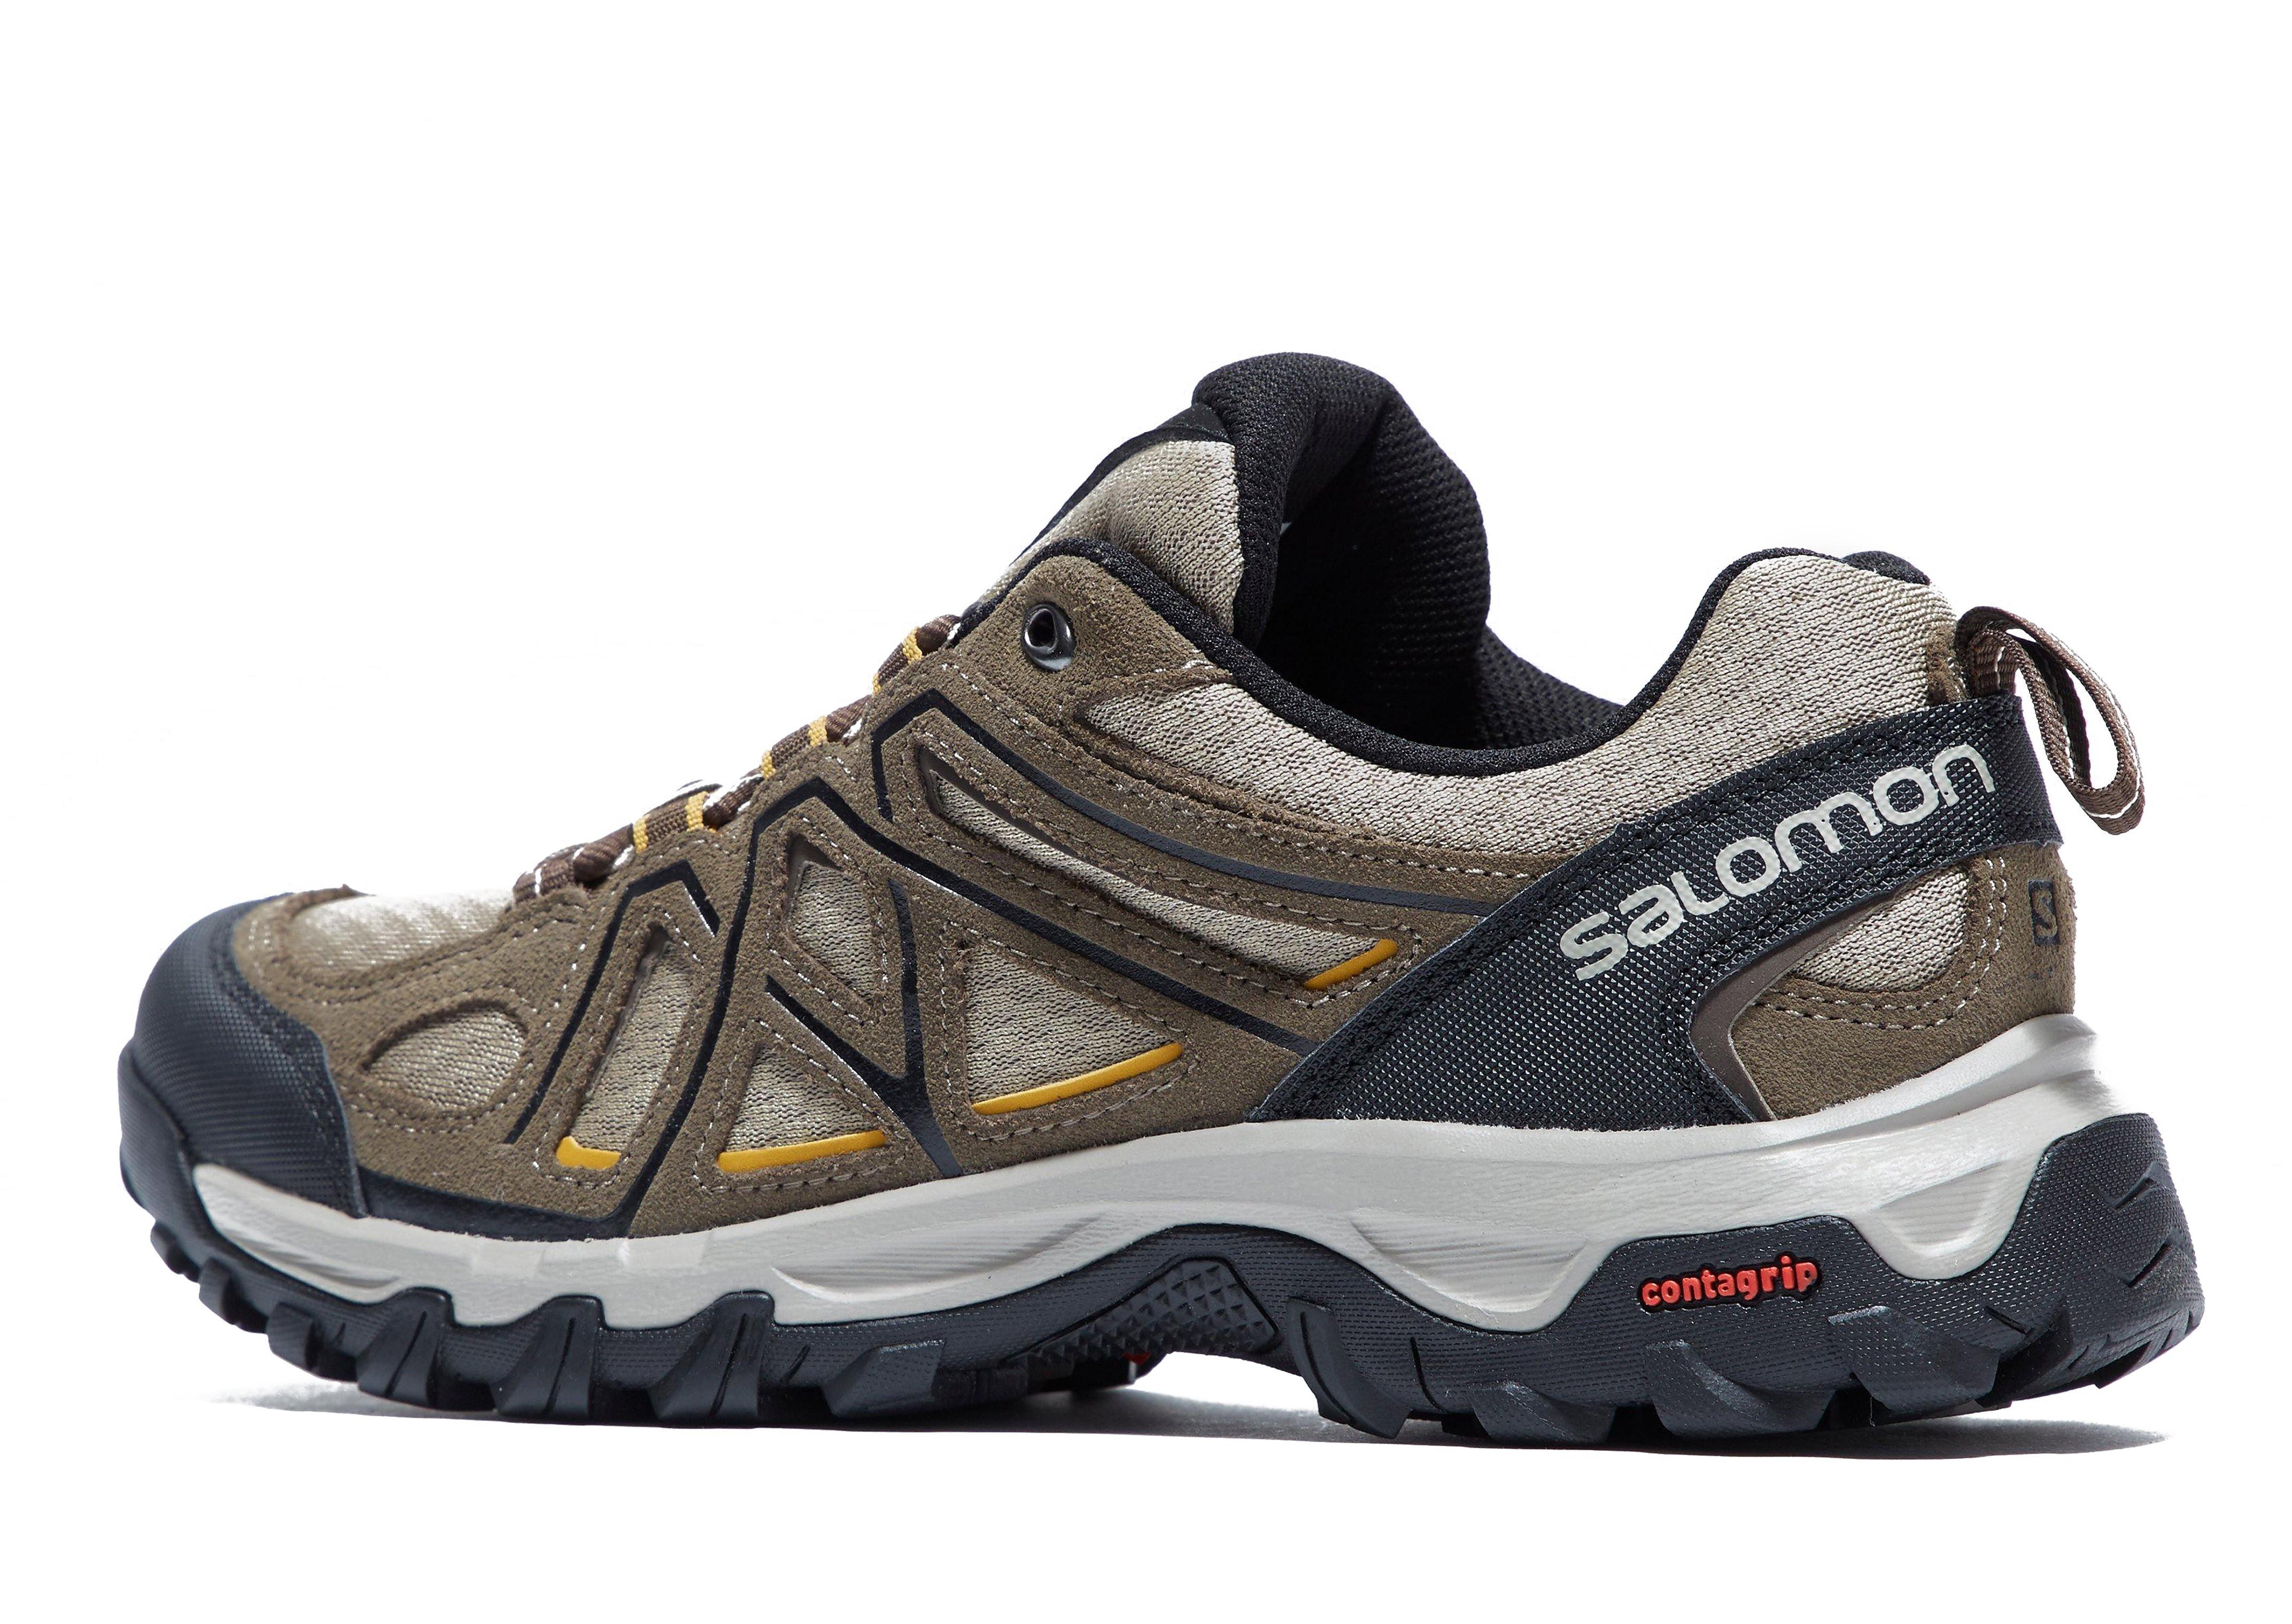 Salomon Evasion 2 Aero Hiking Shoes